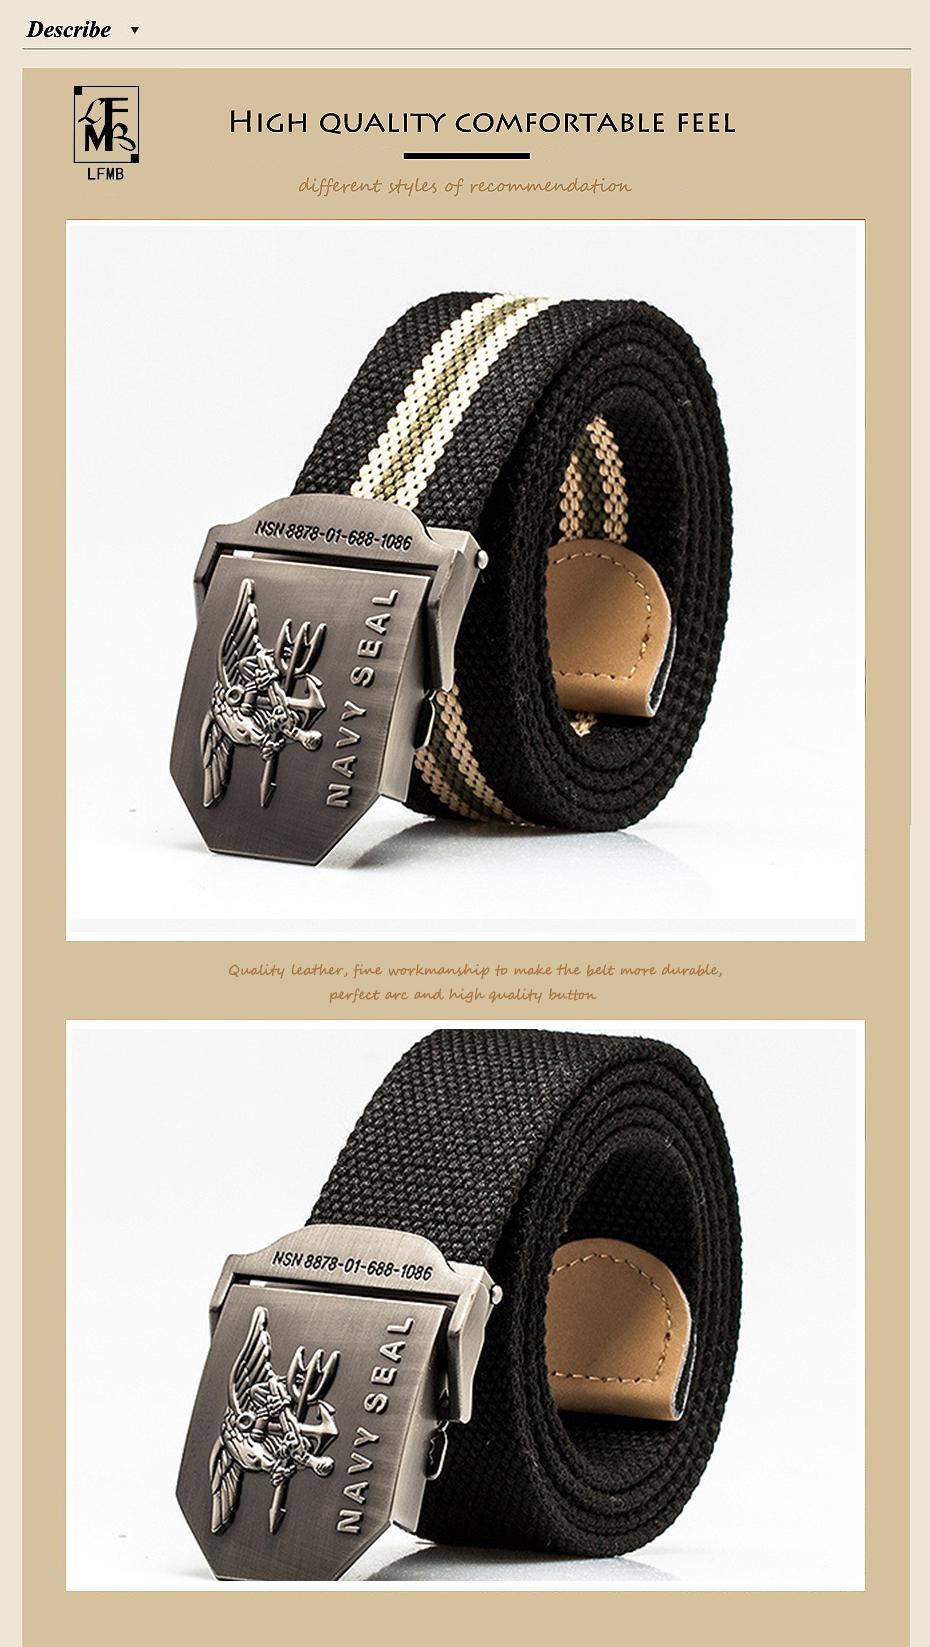 LFMB  cinturón táctico para hombre cinturón de lona hebilla correa táctica  rem jeans cinturones para hombres cinturón de lona táctico militar ... 7e703a53a38c